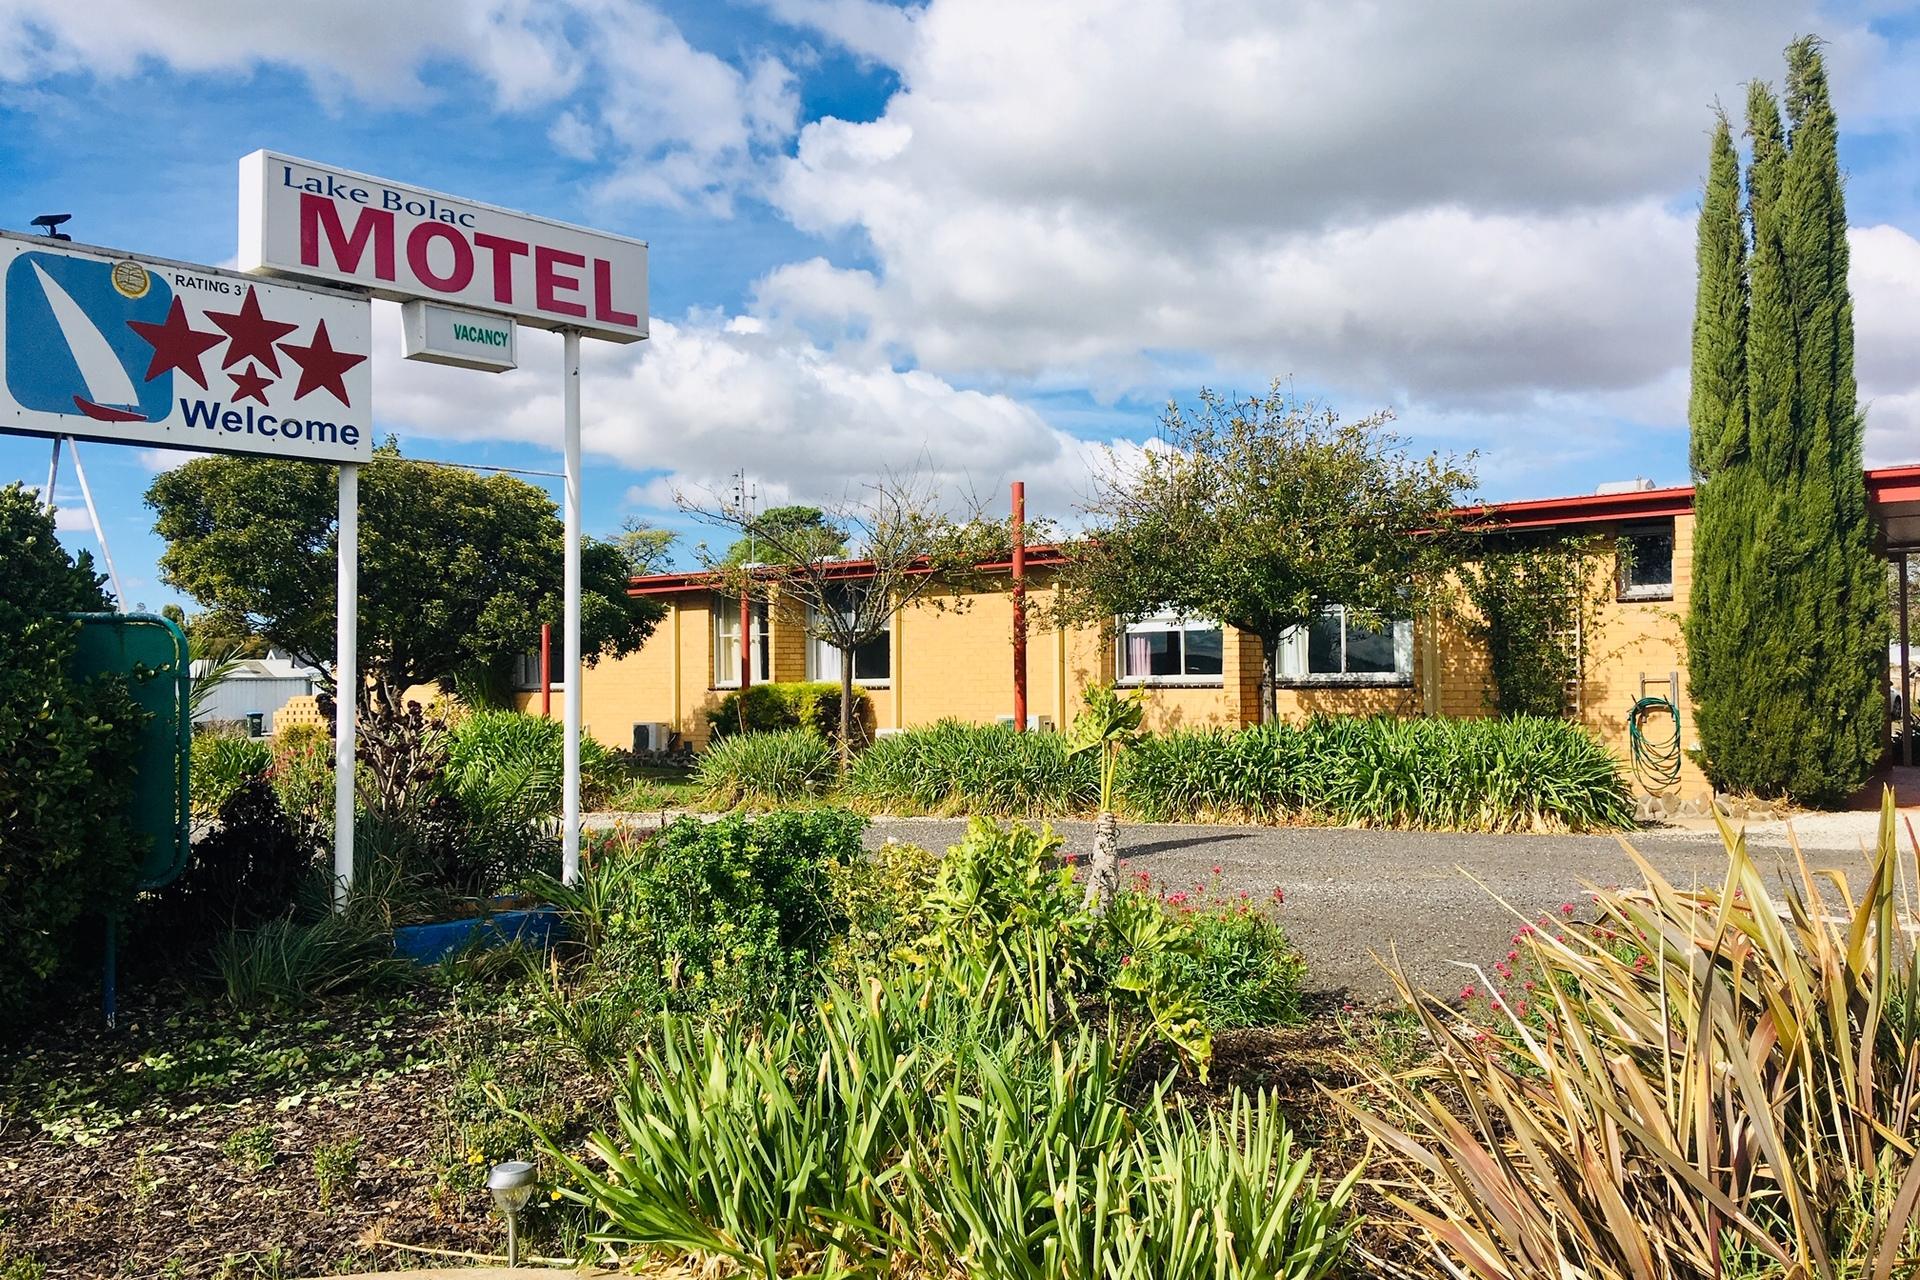 Lake Bolac Motel